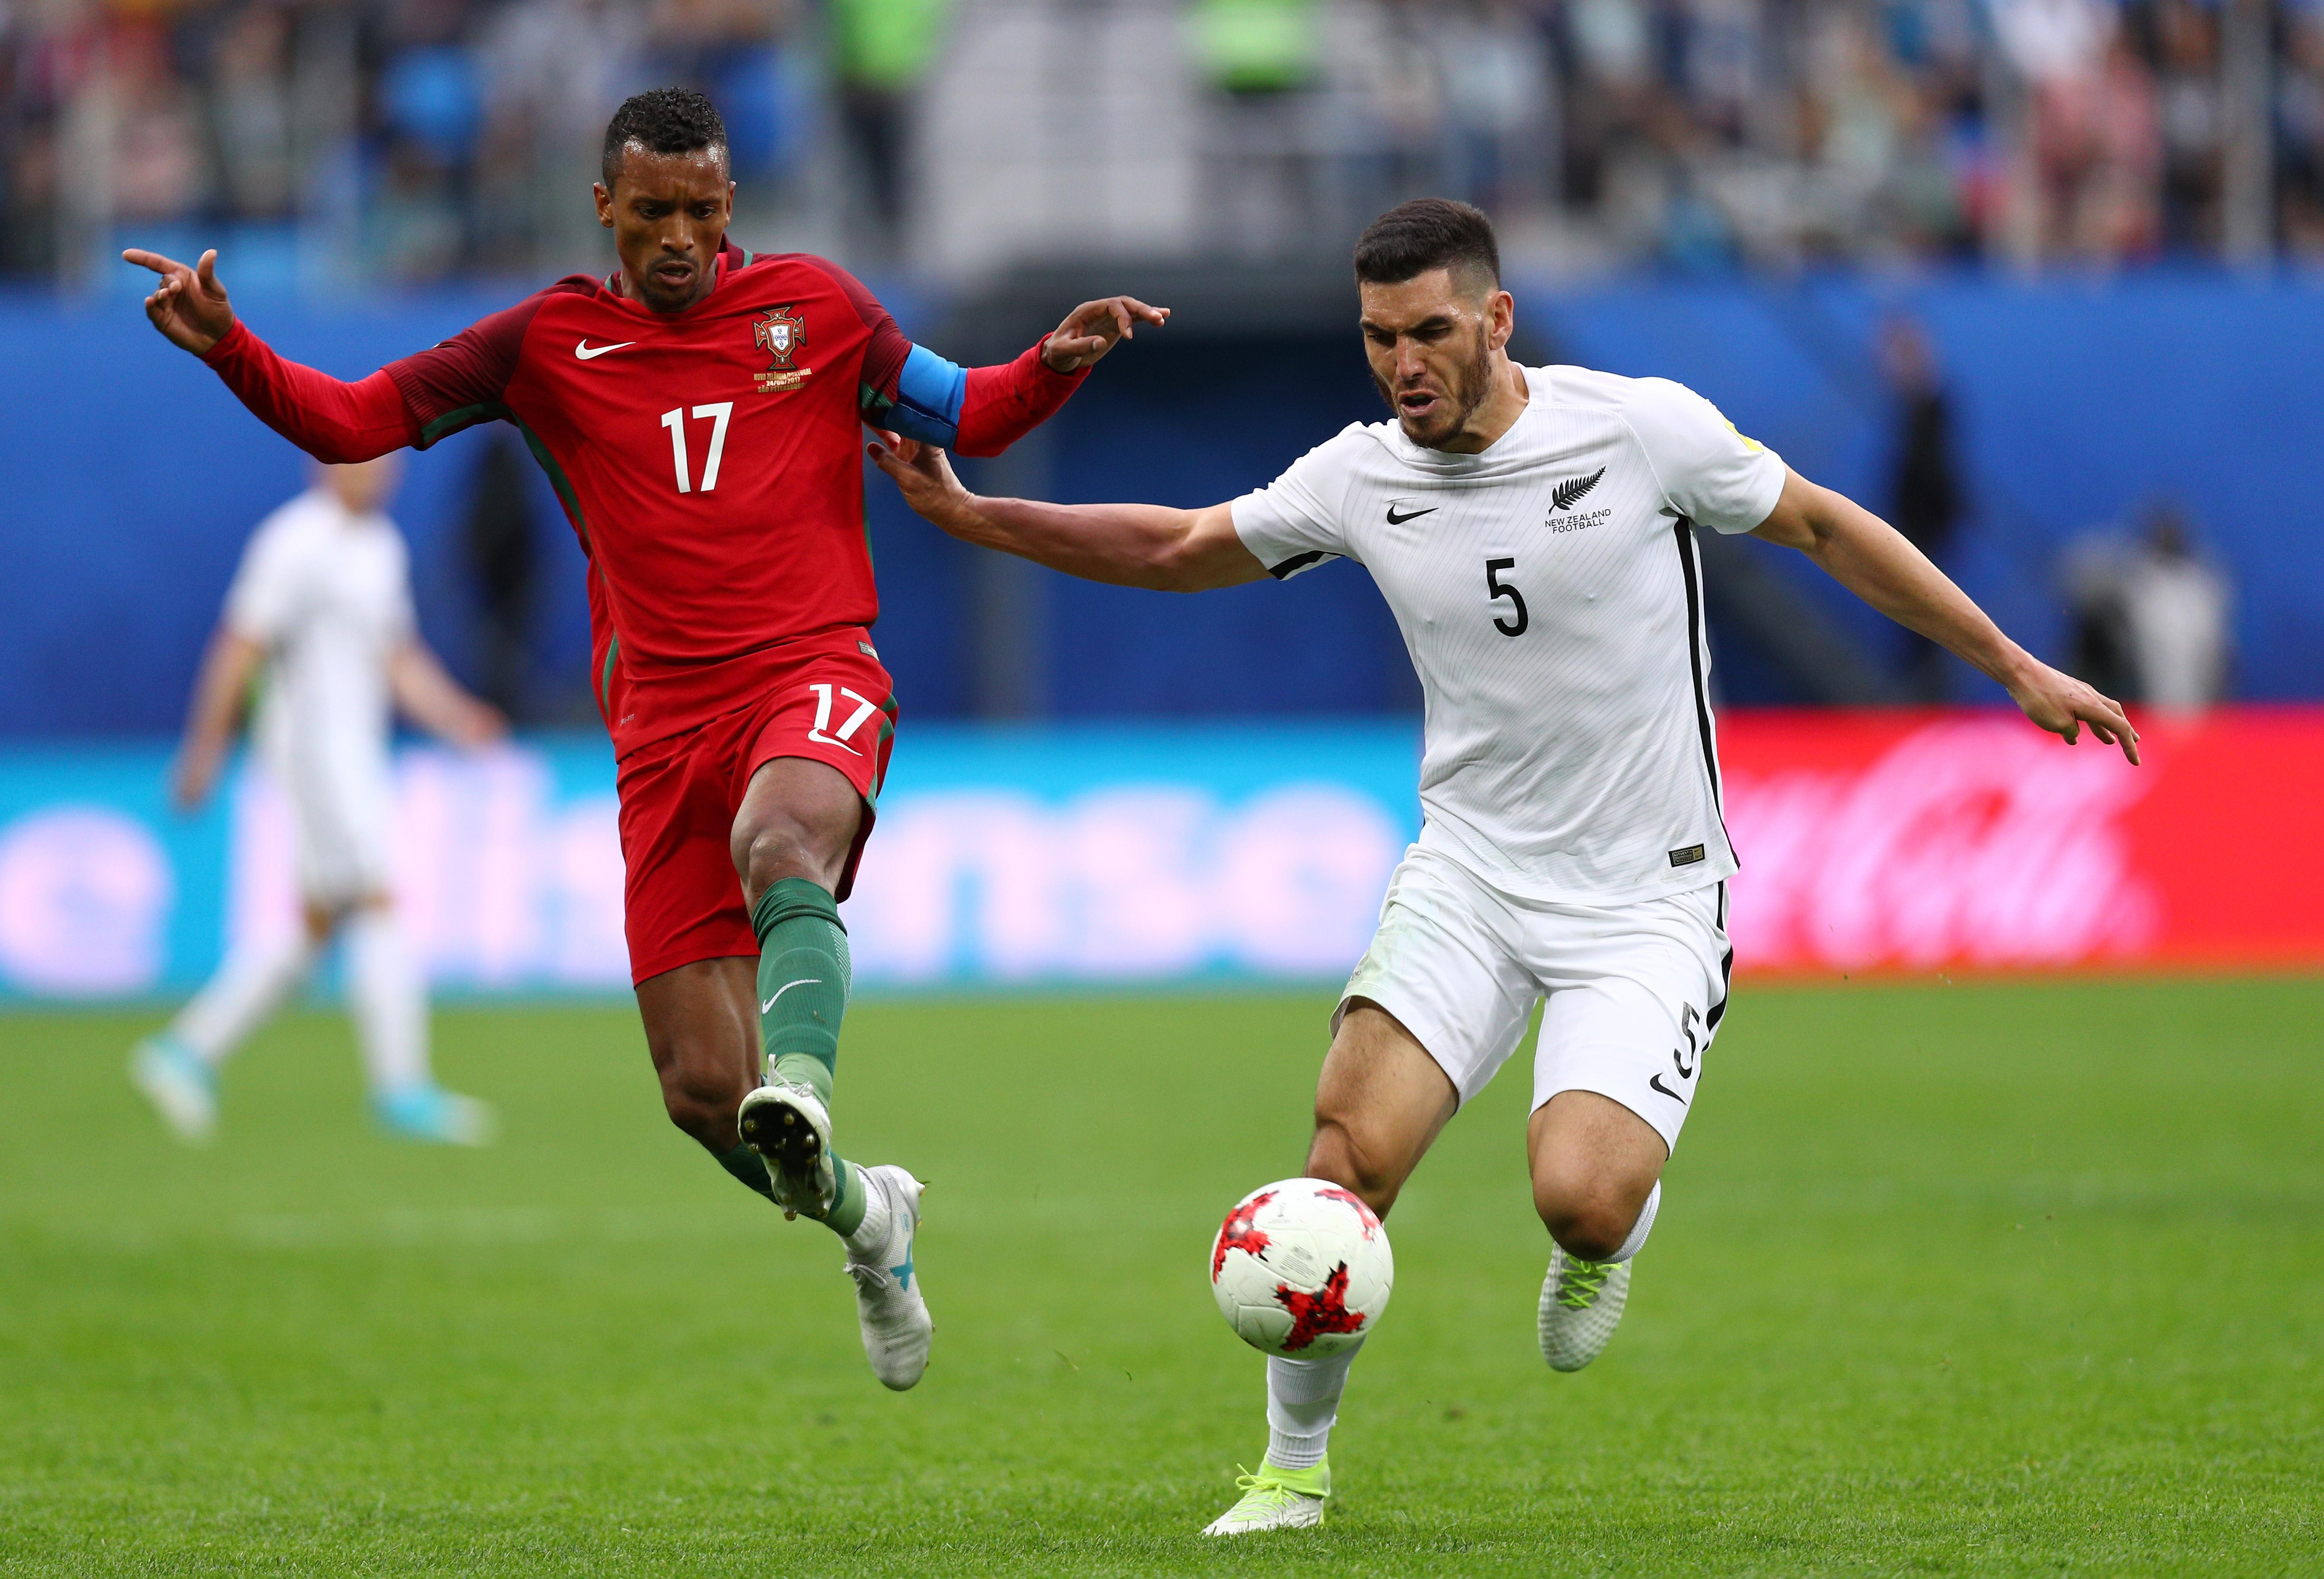 New Zealand v Portugal: Group A - FIFA Confederations Cup Russia 2017